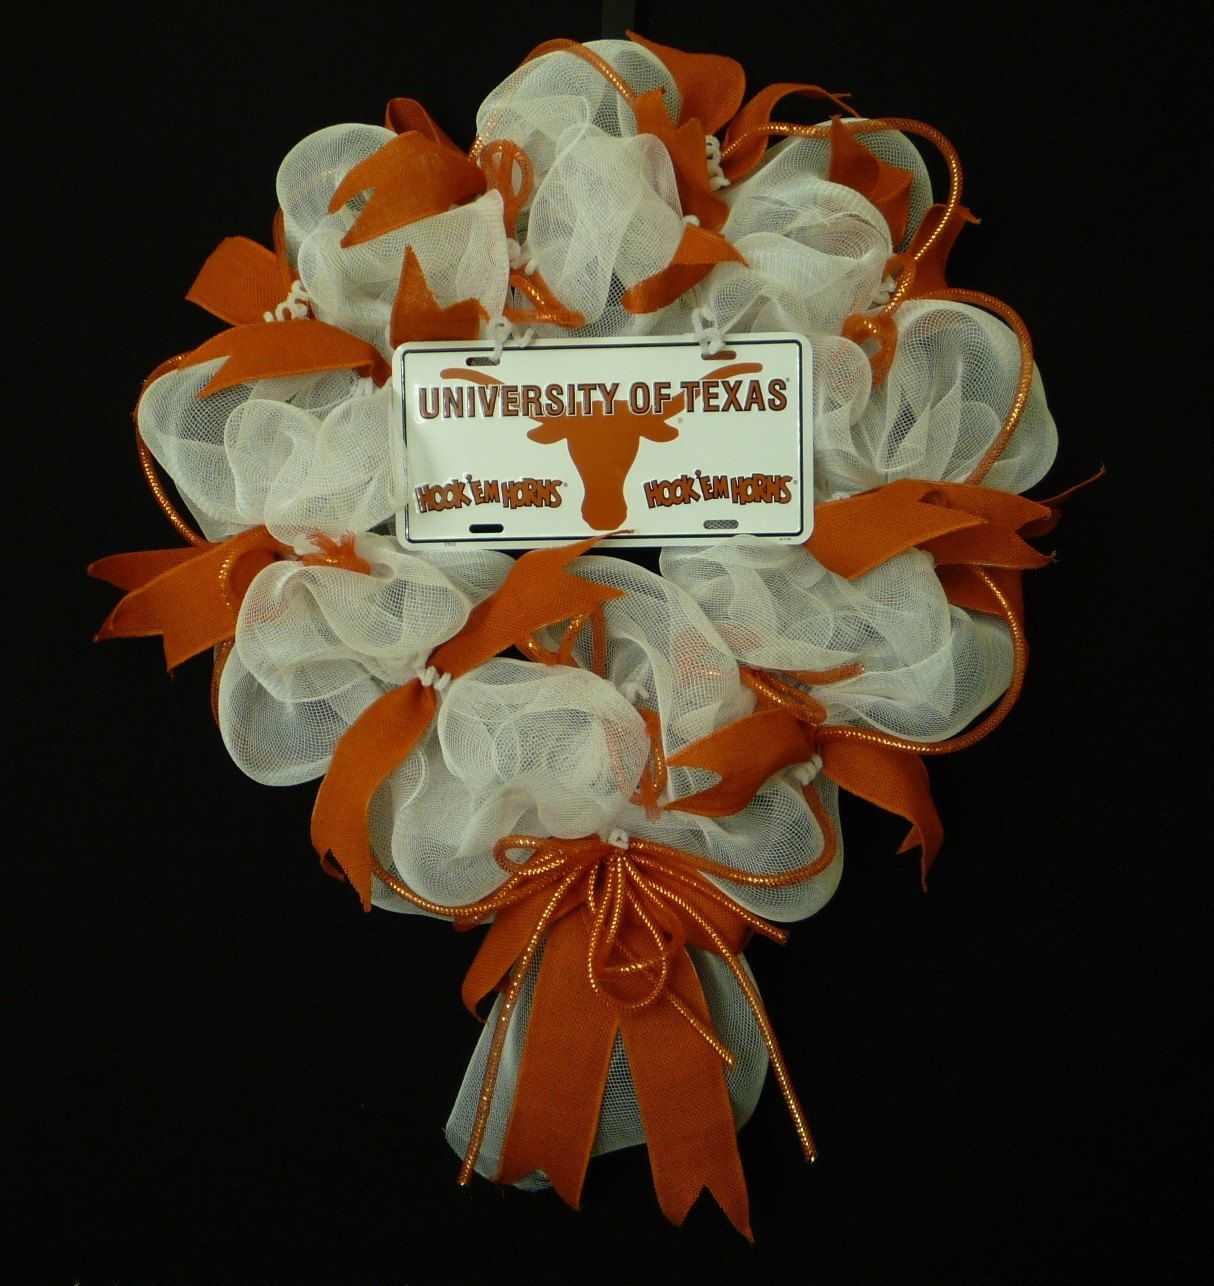 University Of Texas Wreath, so cute!